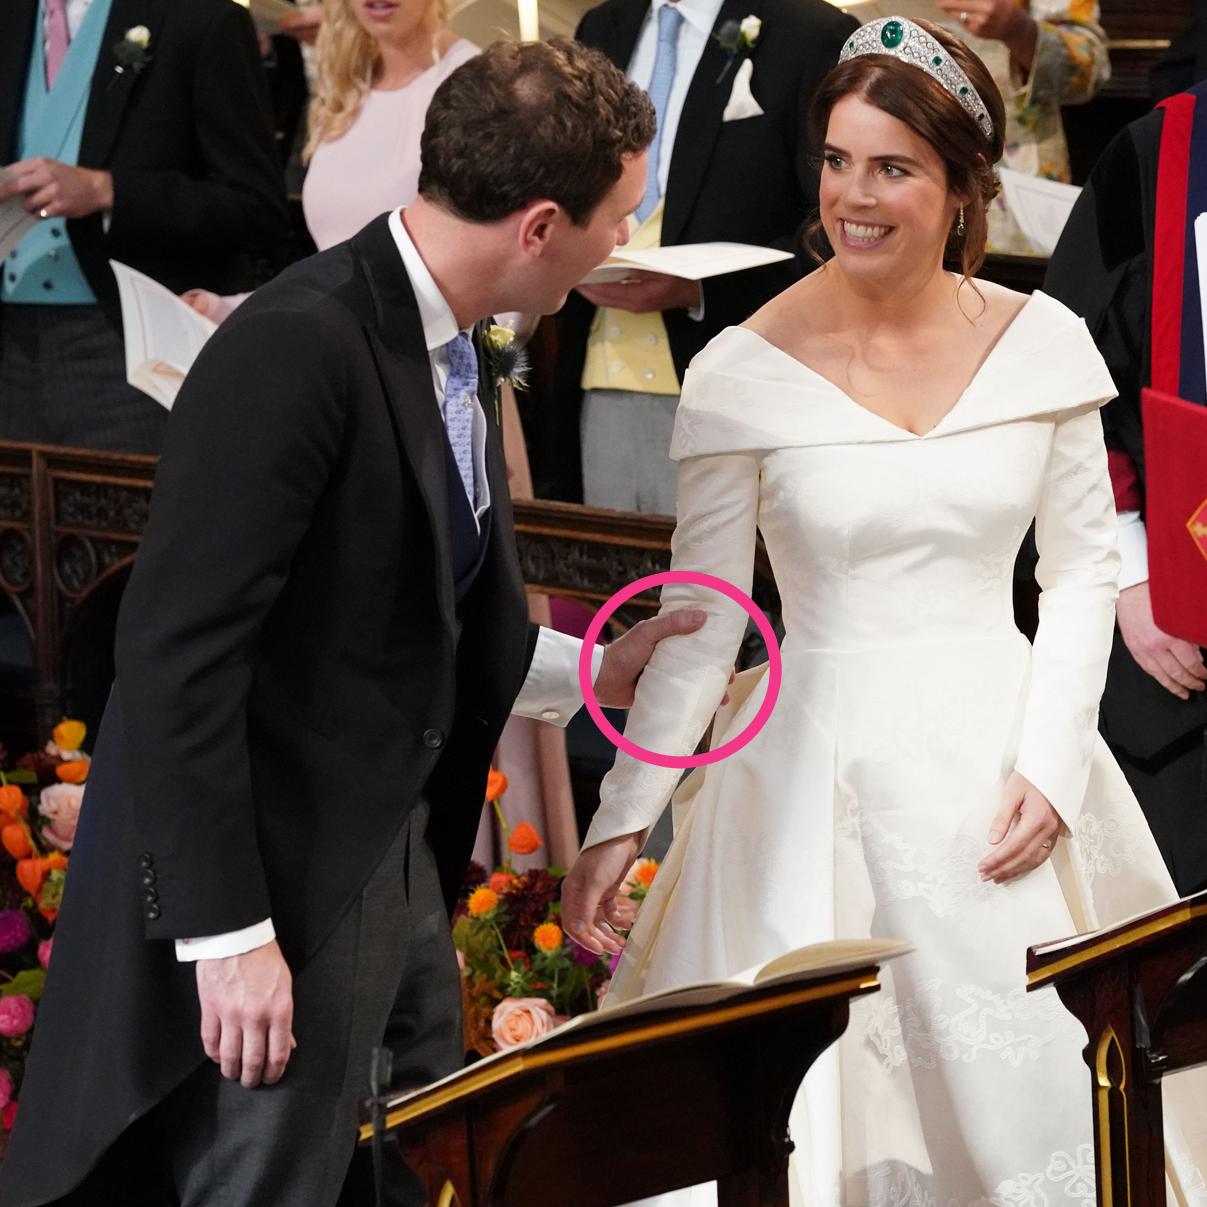 Body Language Experts Analyze Princess Eugenie And Jack Brooksbank S Royal Wedding Eugenie Wedding Royal Wedding Dress Princess Eugenie [ 1207 x 1207 Pixel ]